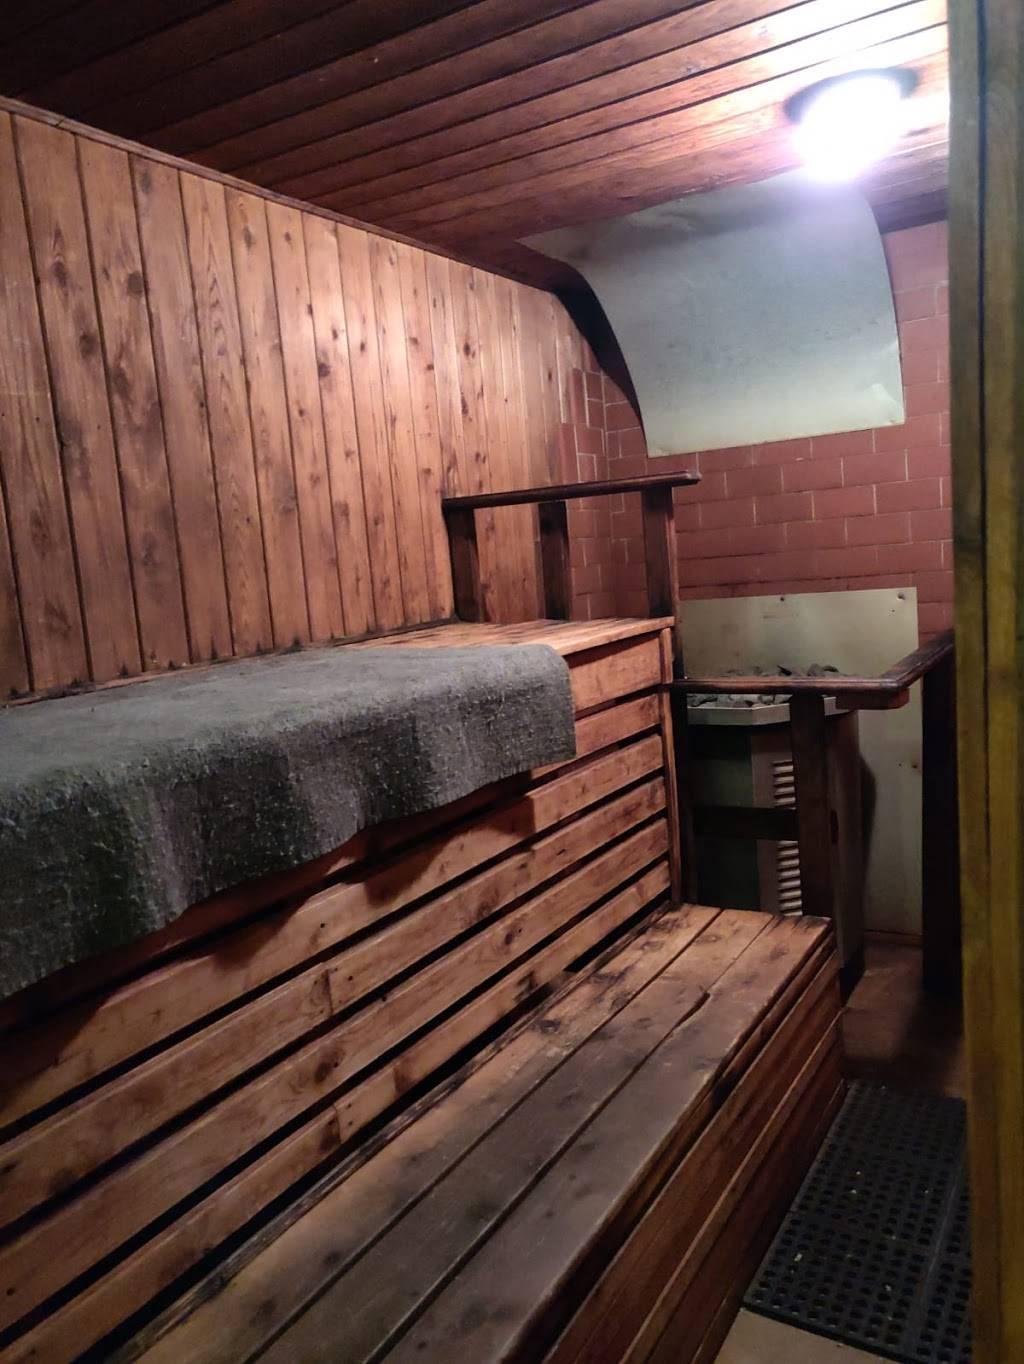 Red Rocks Spa - health  | Photo 2 of 8 | Address: 1842 S Parker Rd Unit 21, Denver, CO 80231, USA | Phone: (303) 495-5576